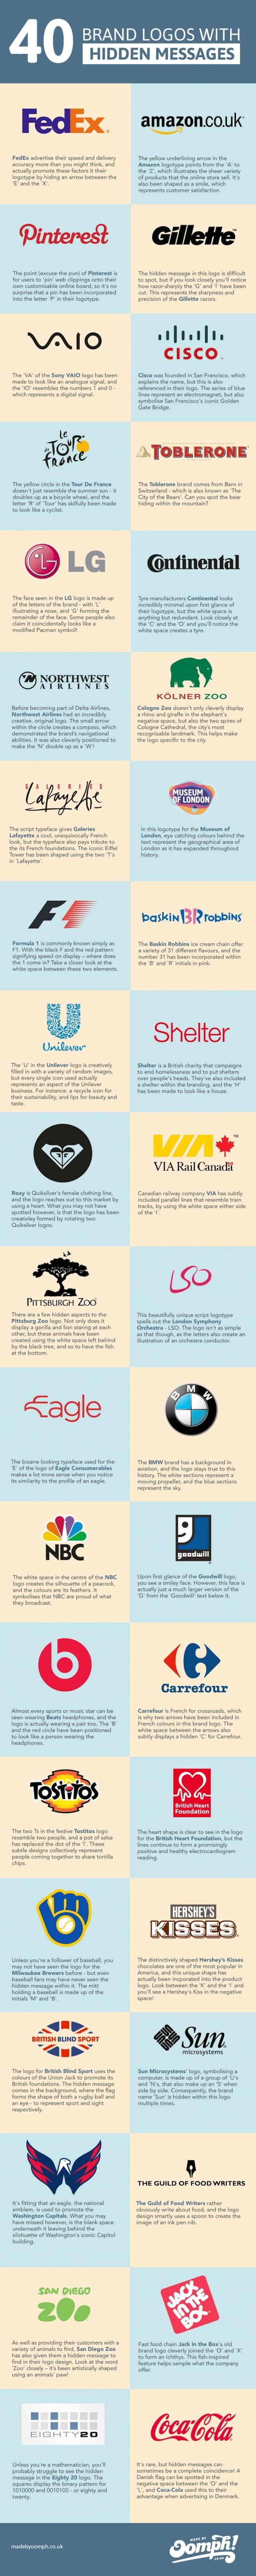 Meaning behind brand logos